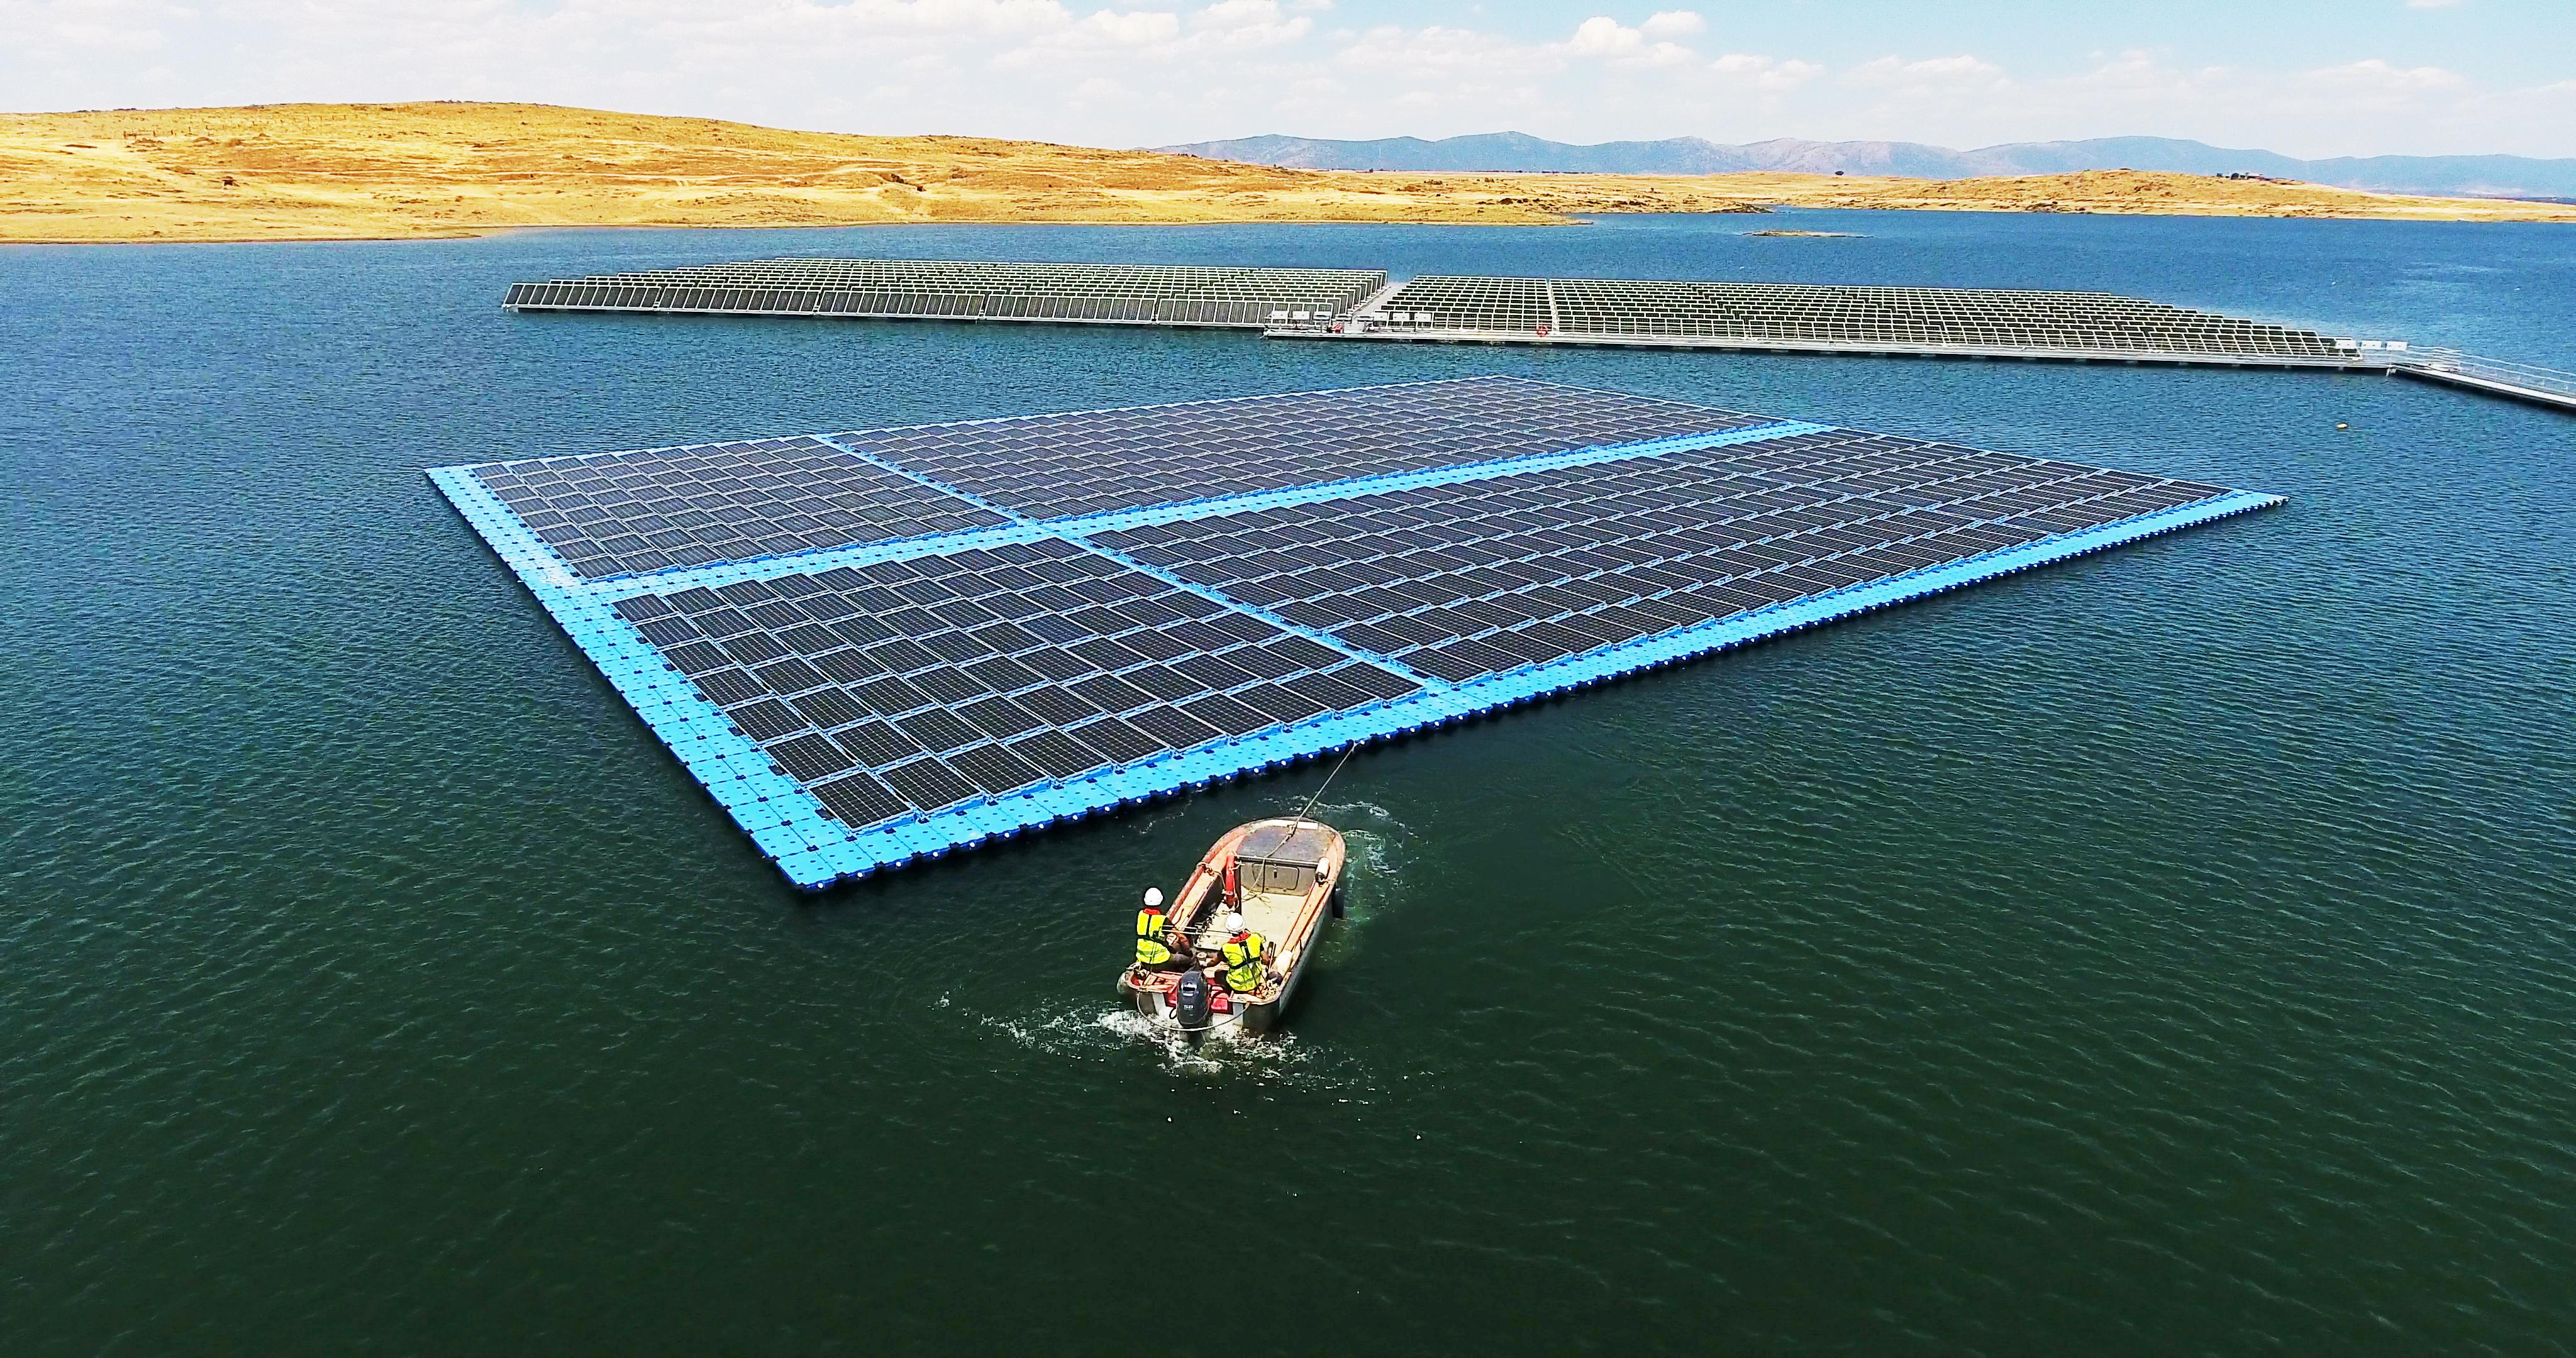 la primera planta fotovoltaica flotante de España en Zorita